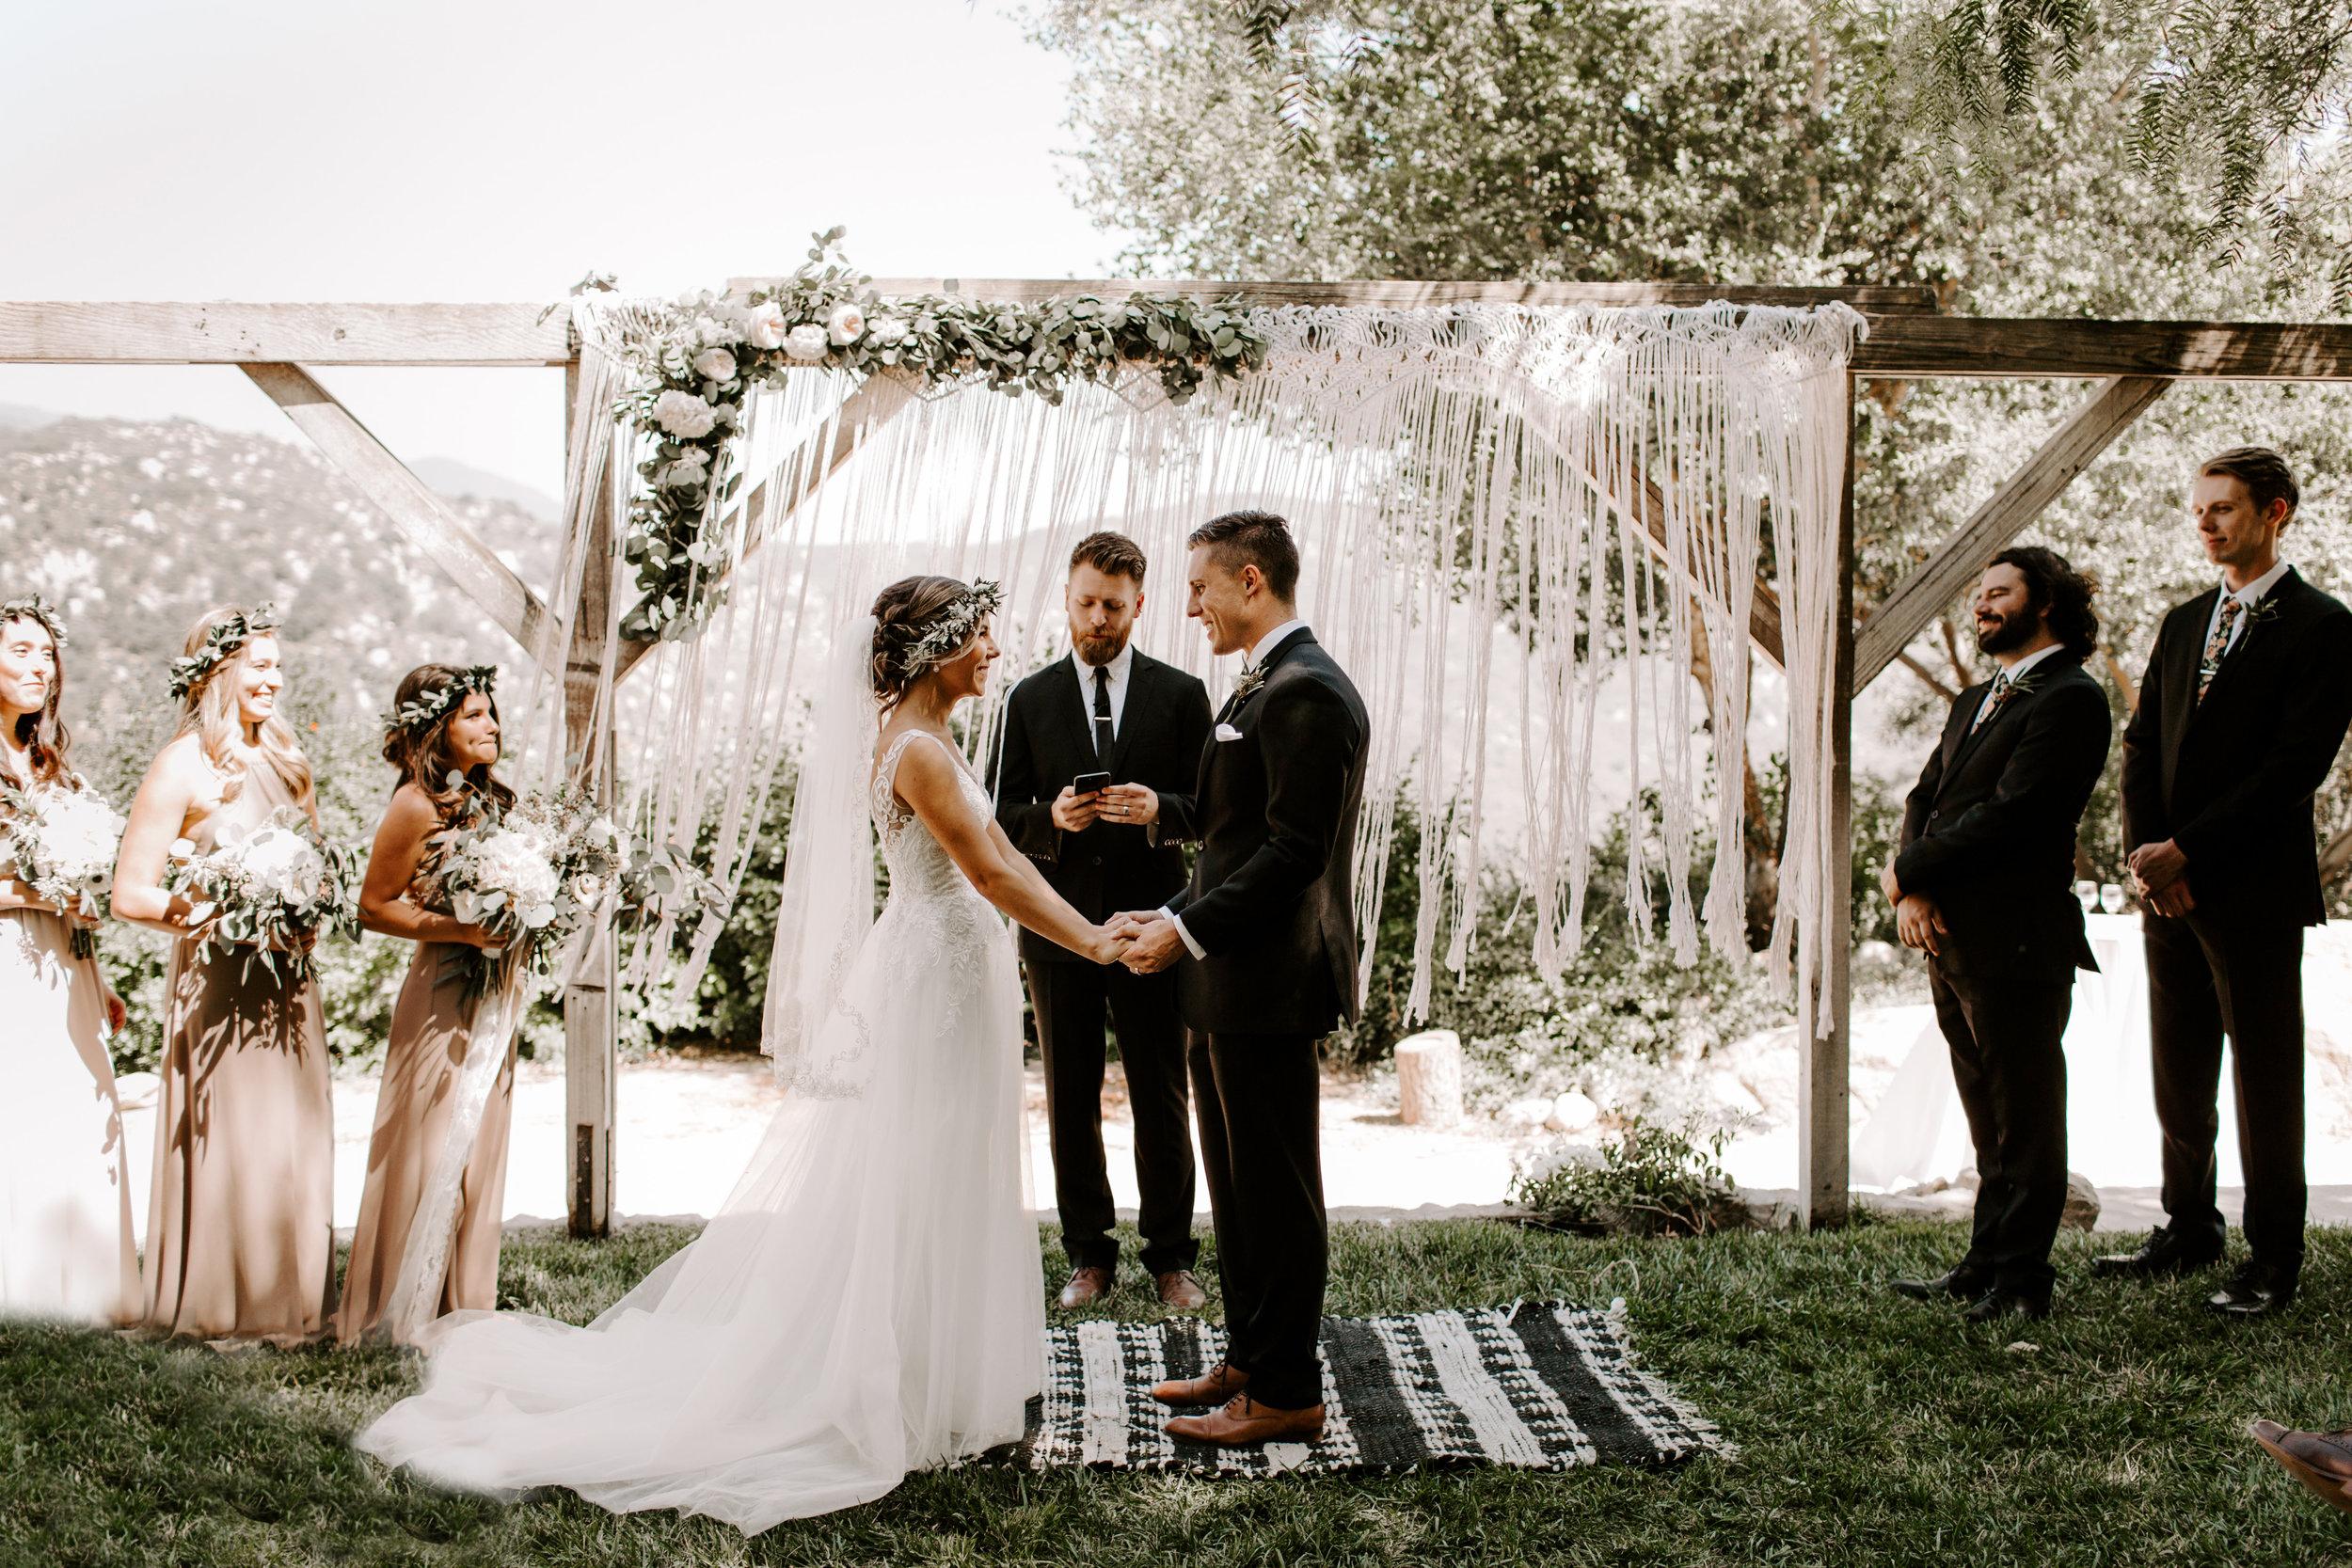 kate+zack_wedding_secludedgardenestate_temecula_madisonrylee_0384.jpg